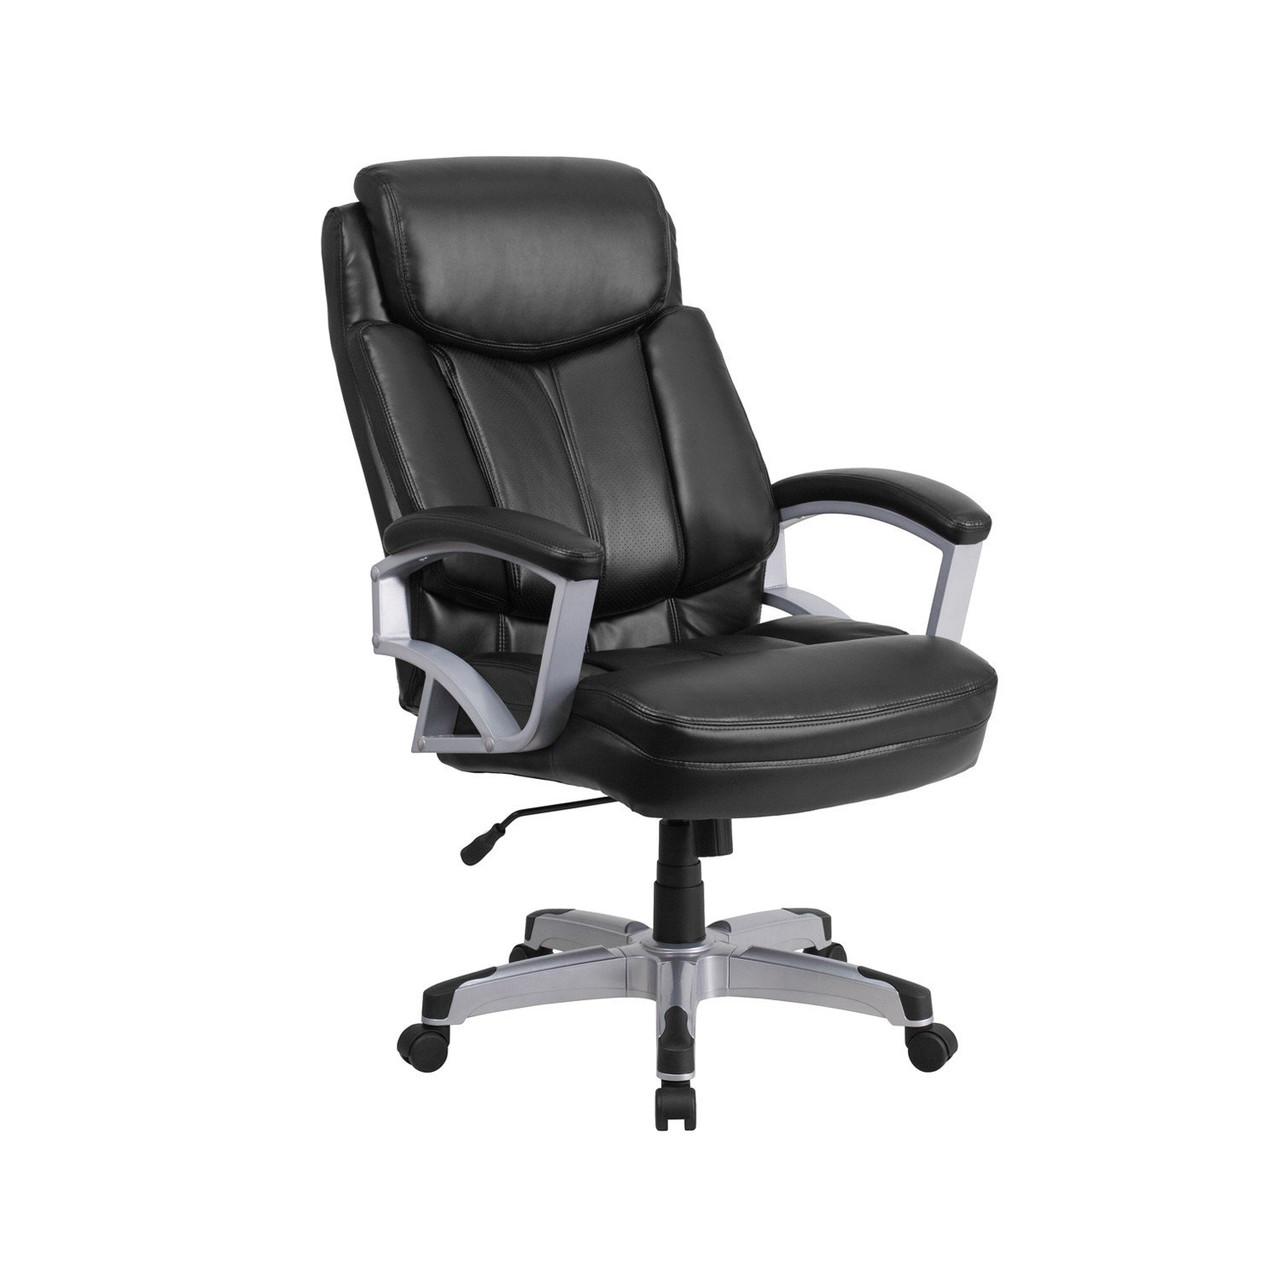 Hercules Big & Tall Executive Swivel Chair by Flash Furniture